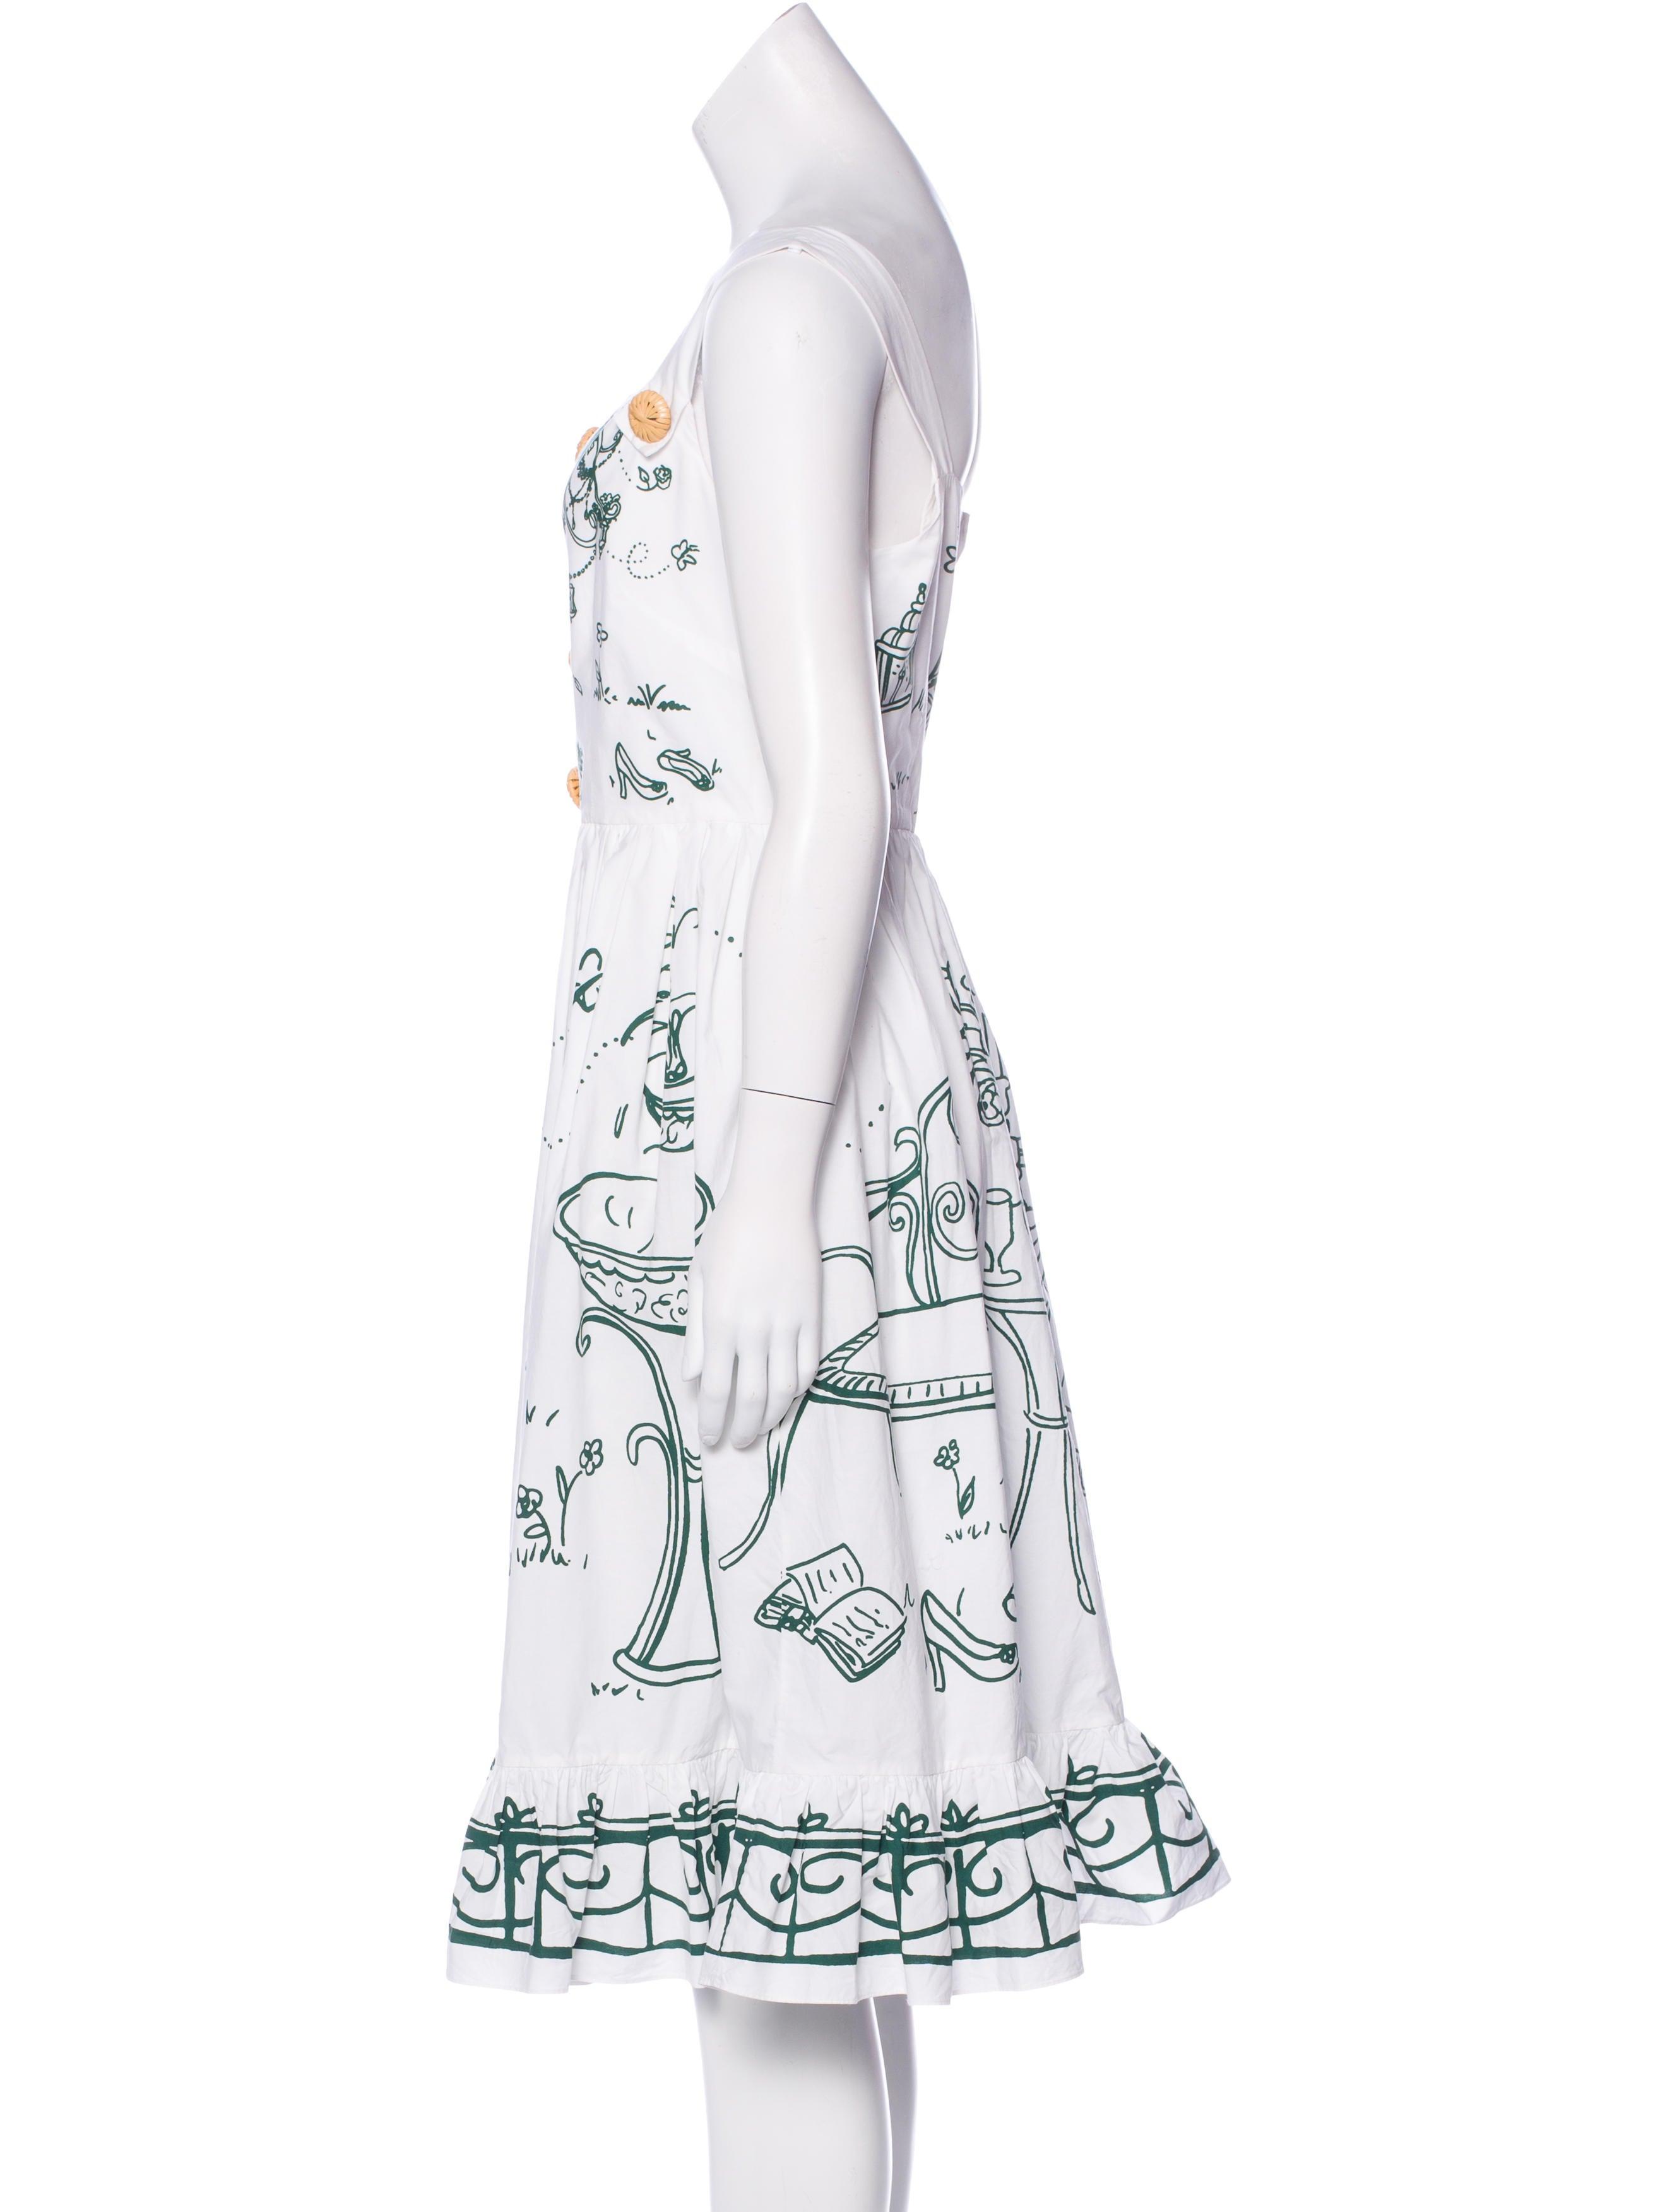 Dolce Gabbana 2016 Garden Print Dress Clothing Dag85594 The Realreal